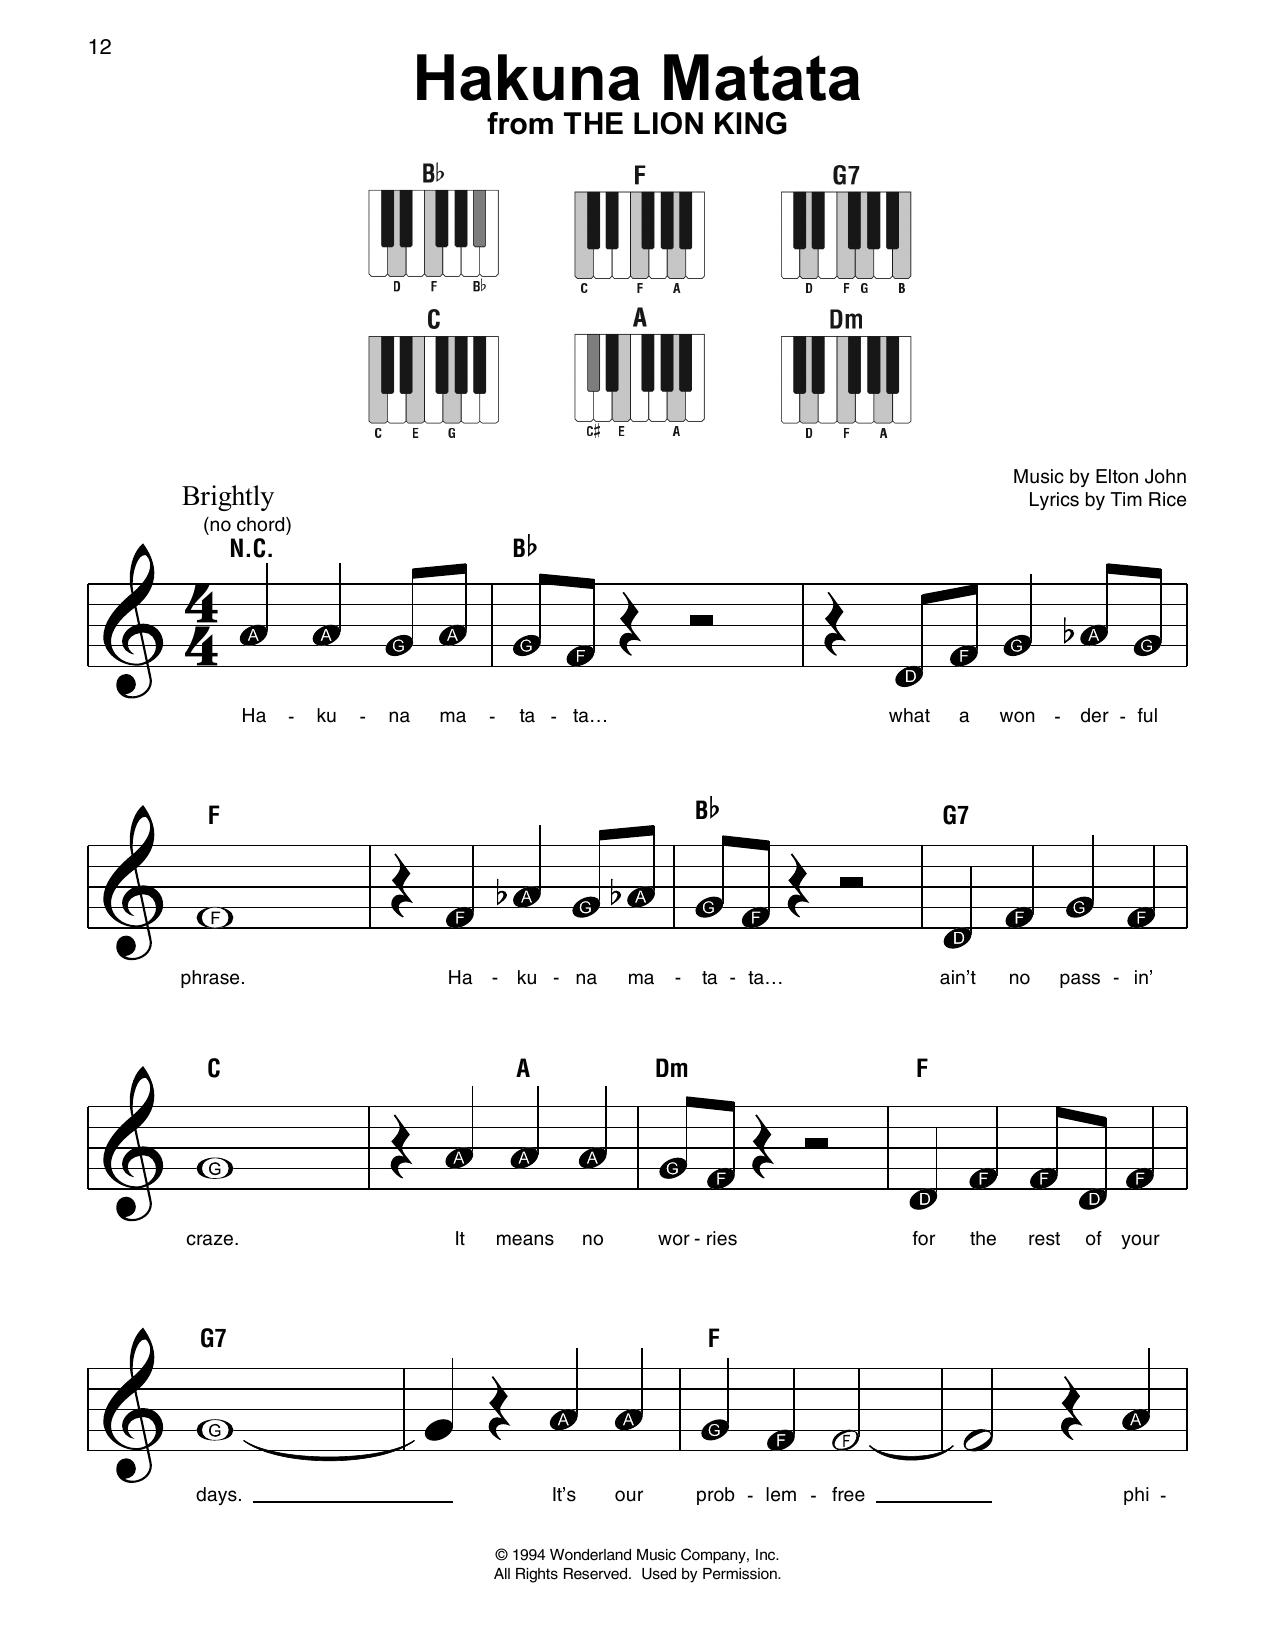 Hakuna Matata Sheet Music